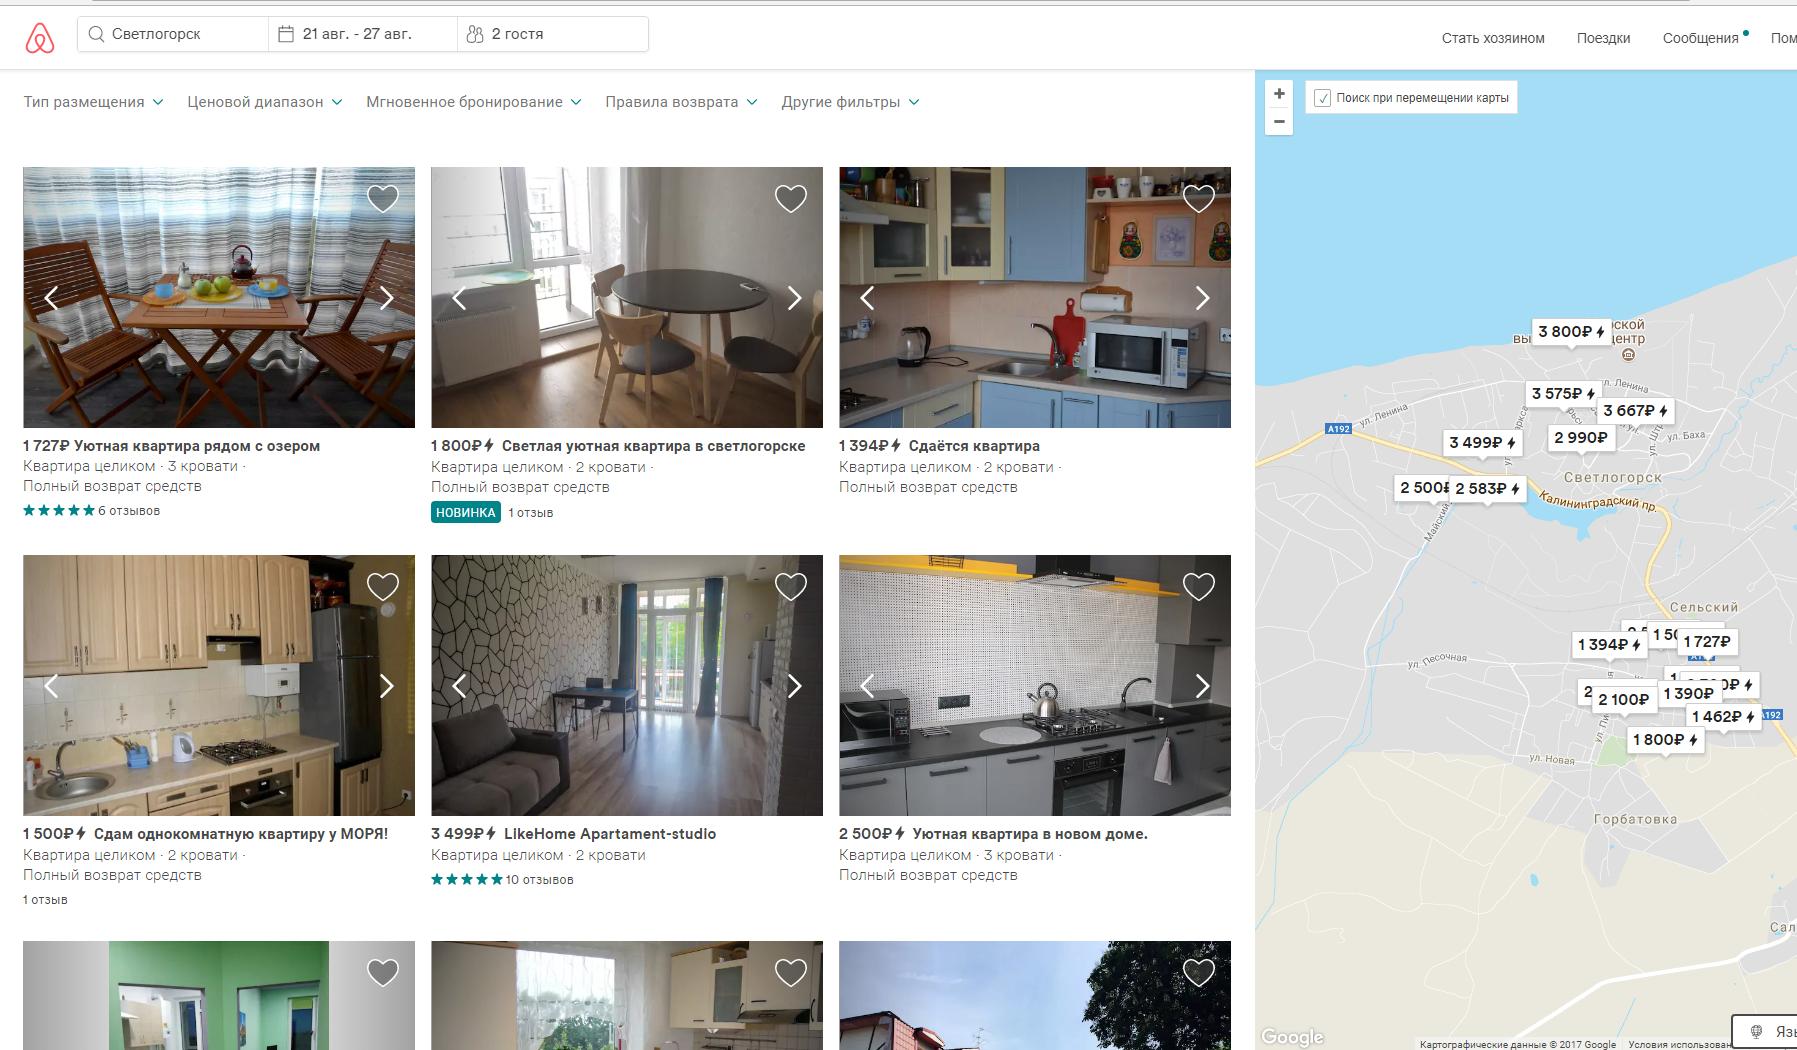 Аренда квартир и домов в Калининграде